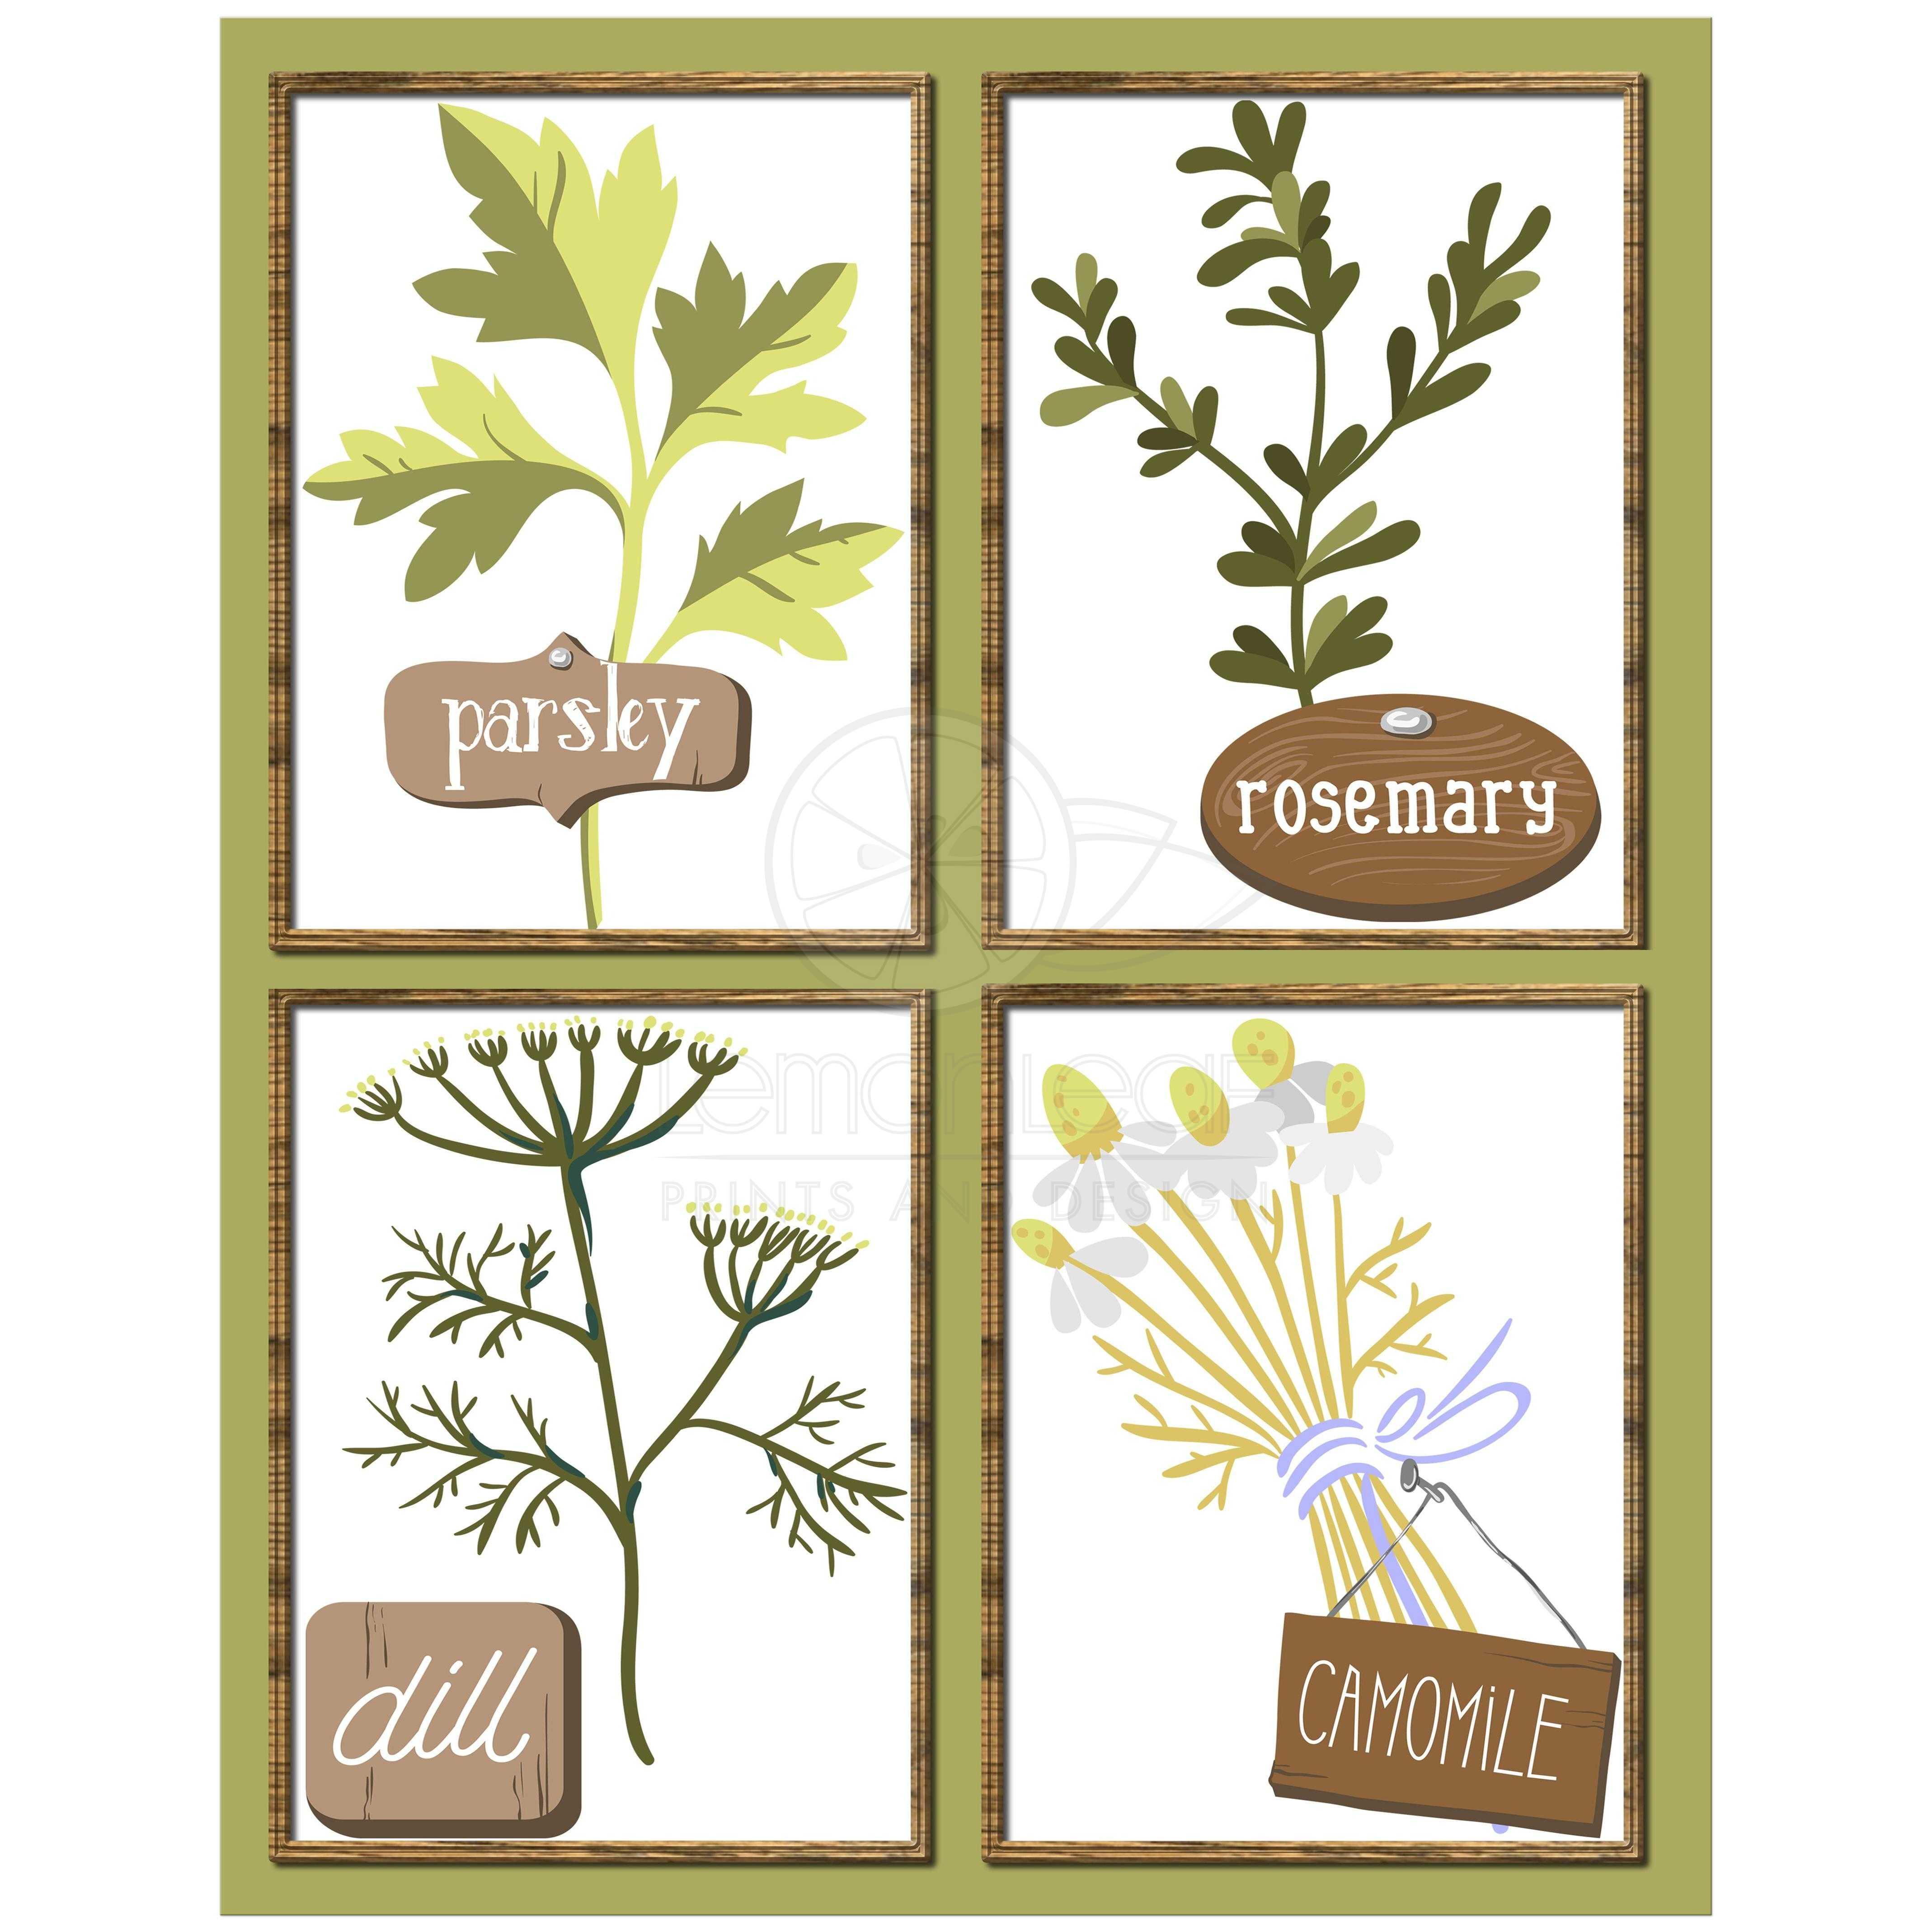 11x14 Herb Garden Contemporary Kitchen Wall Art